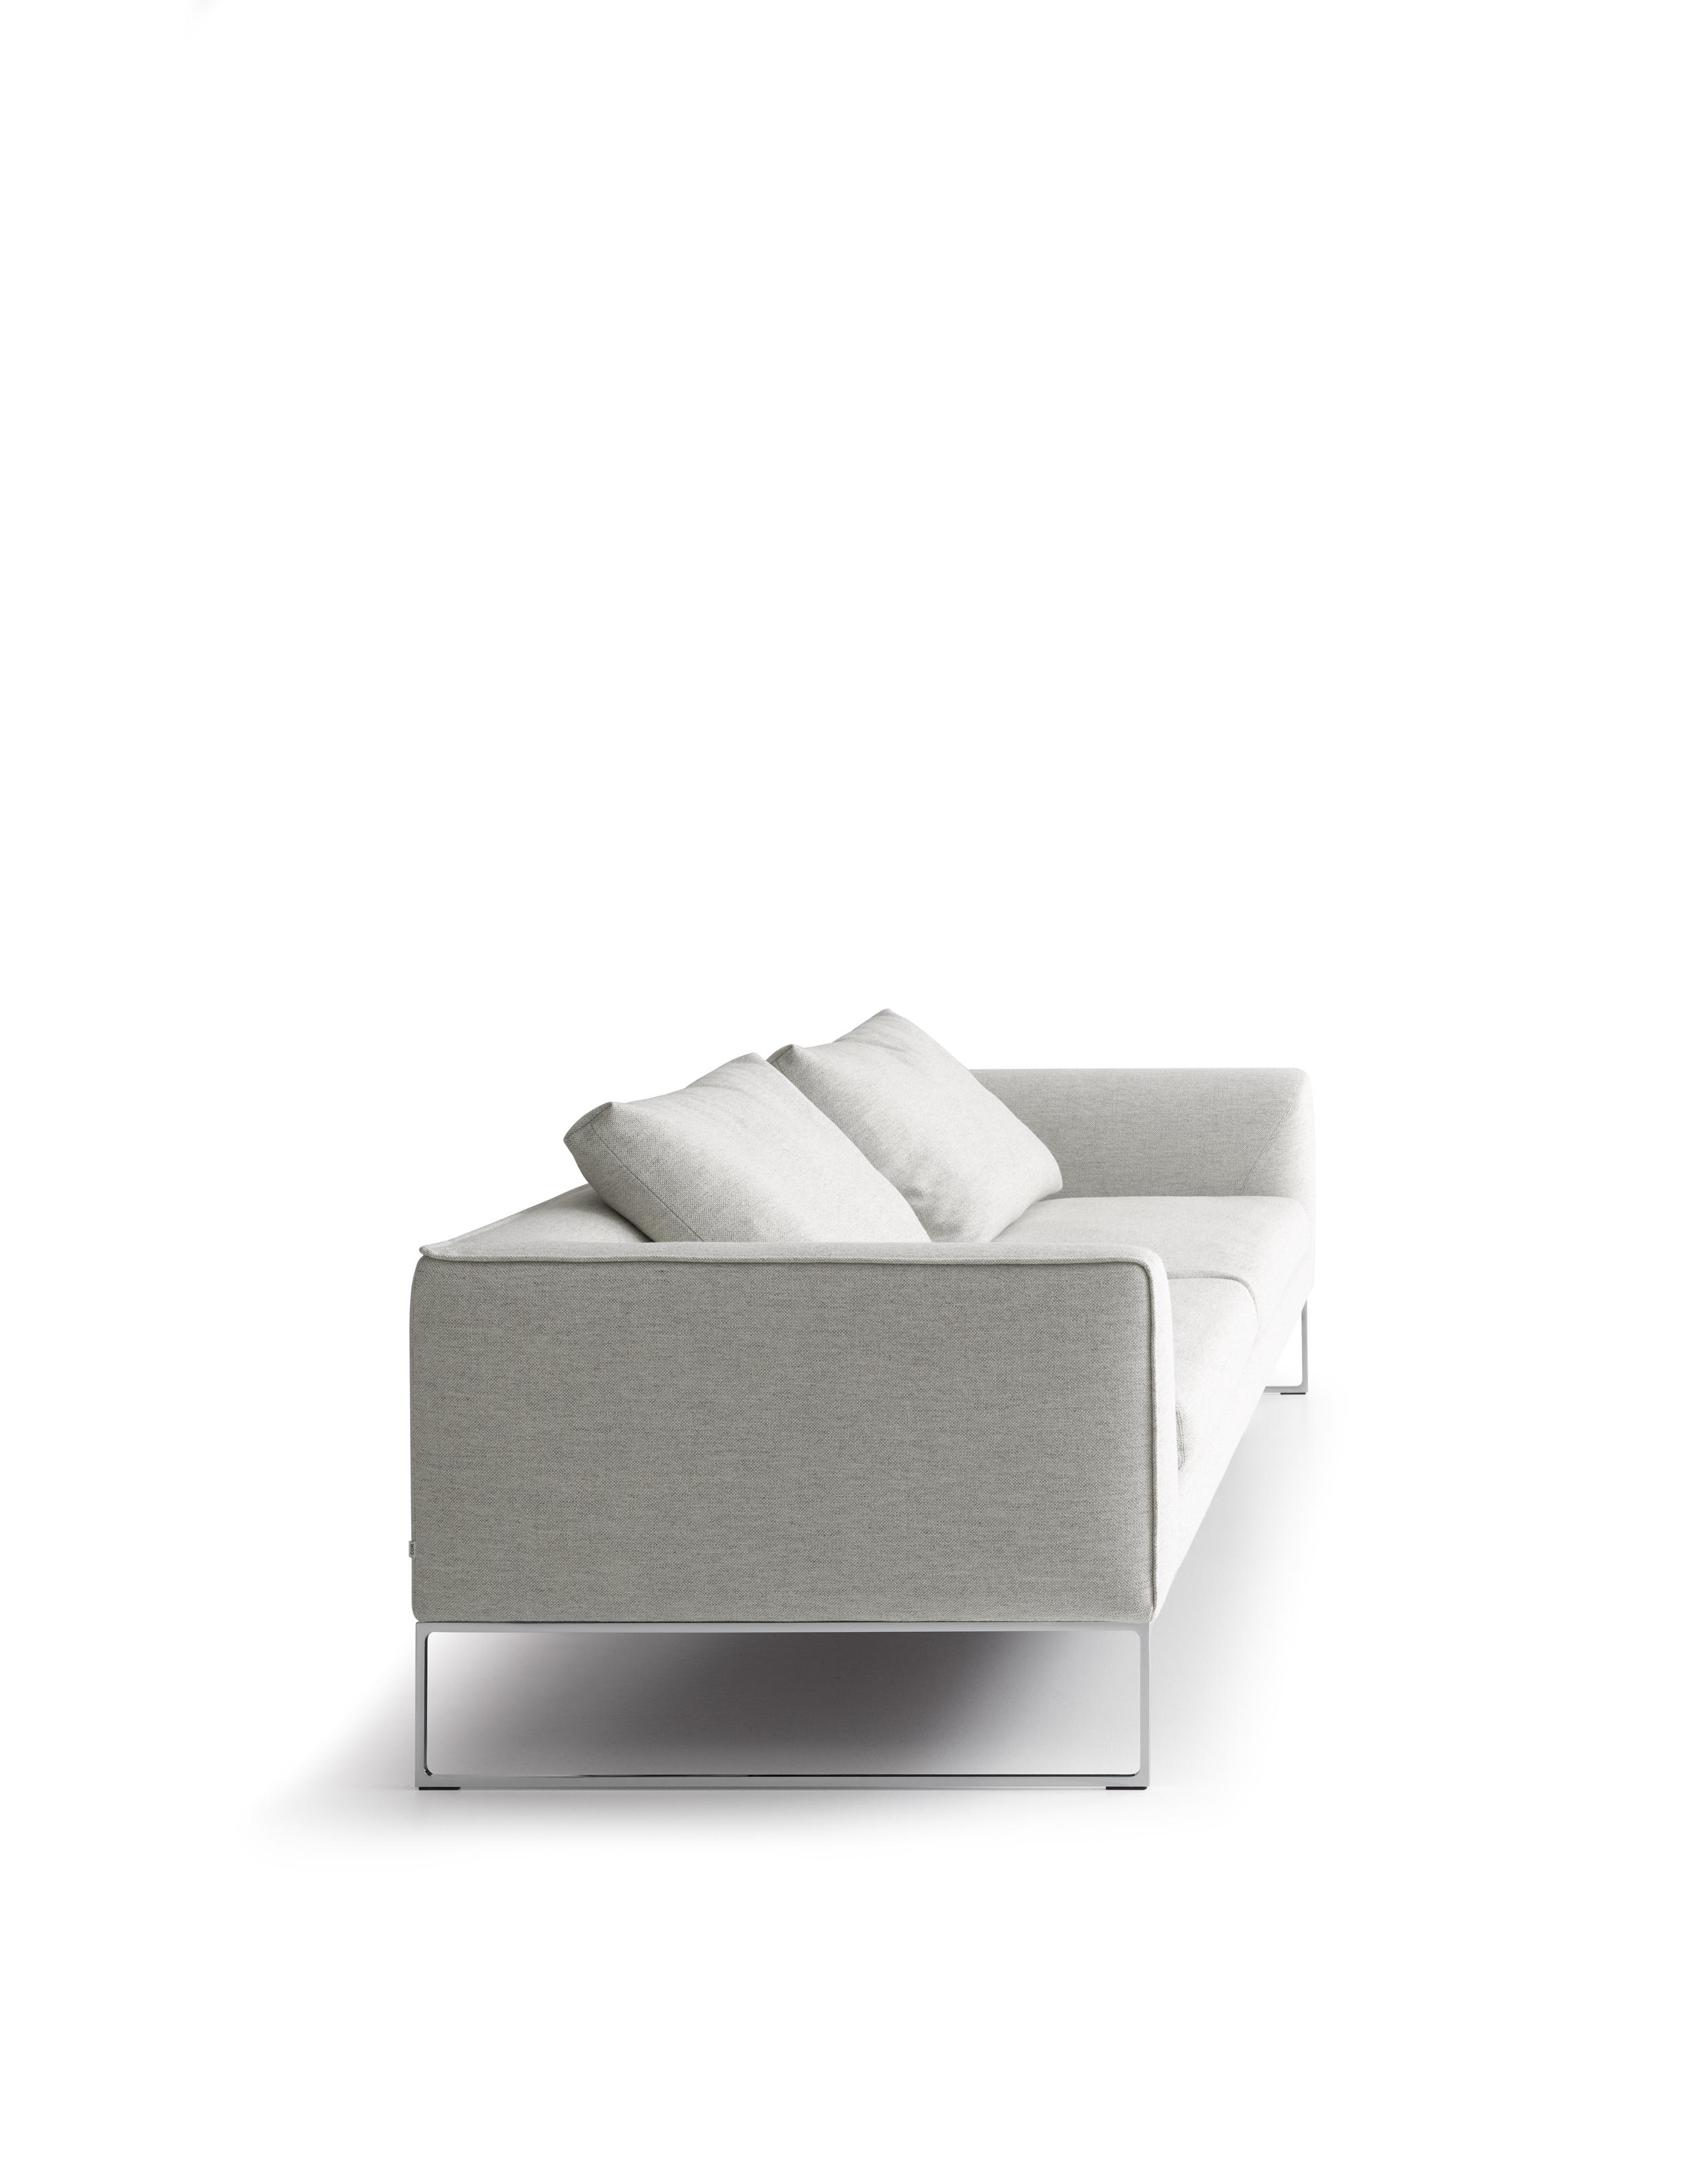 mell lounge sofa professional cor. Black Bedroom Furniture Sets. Home Design Ideas